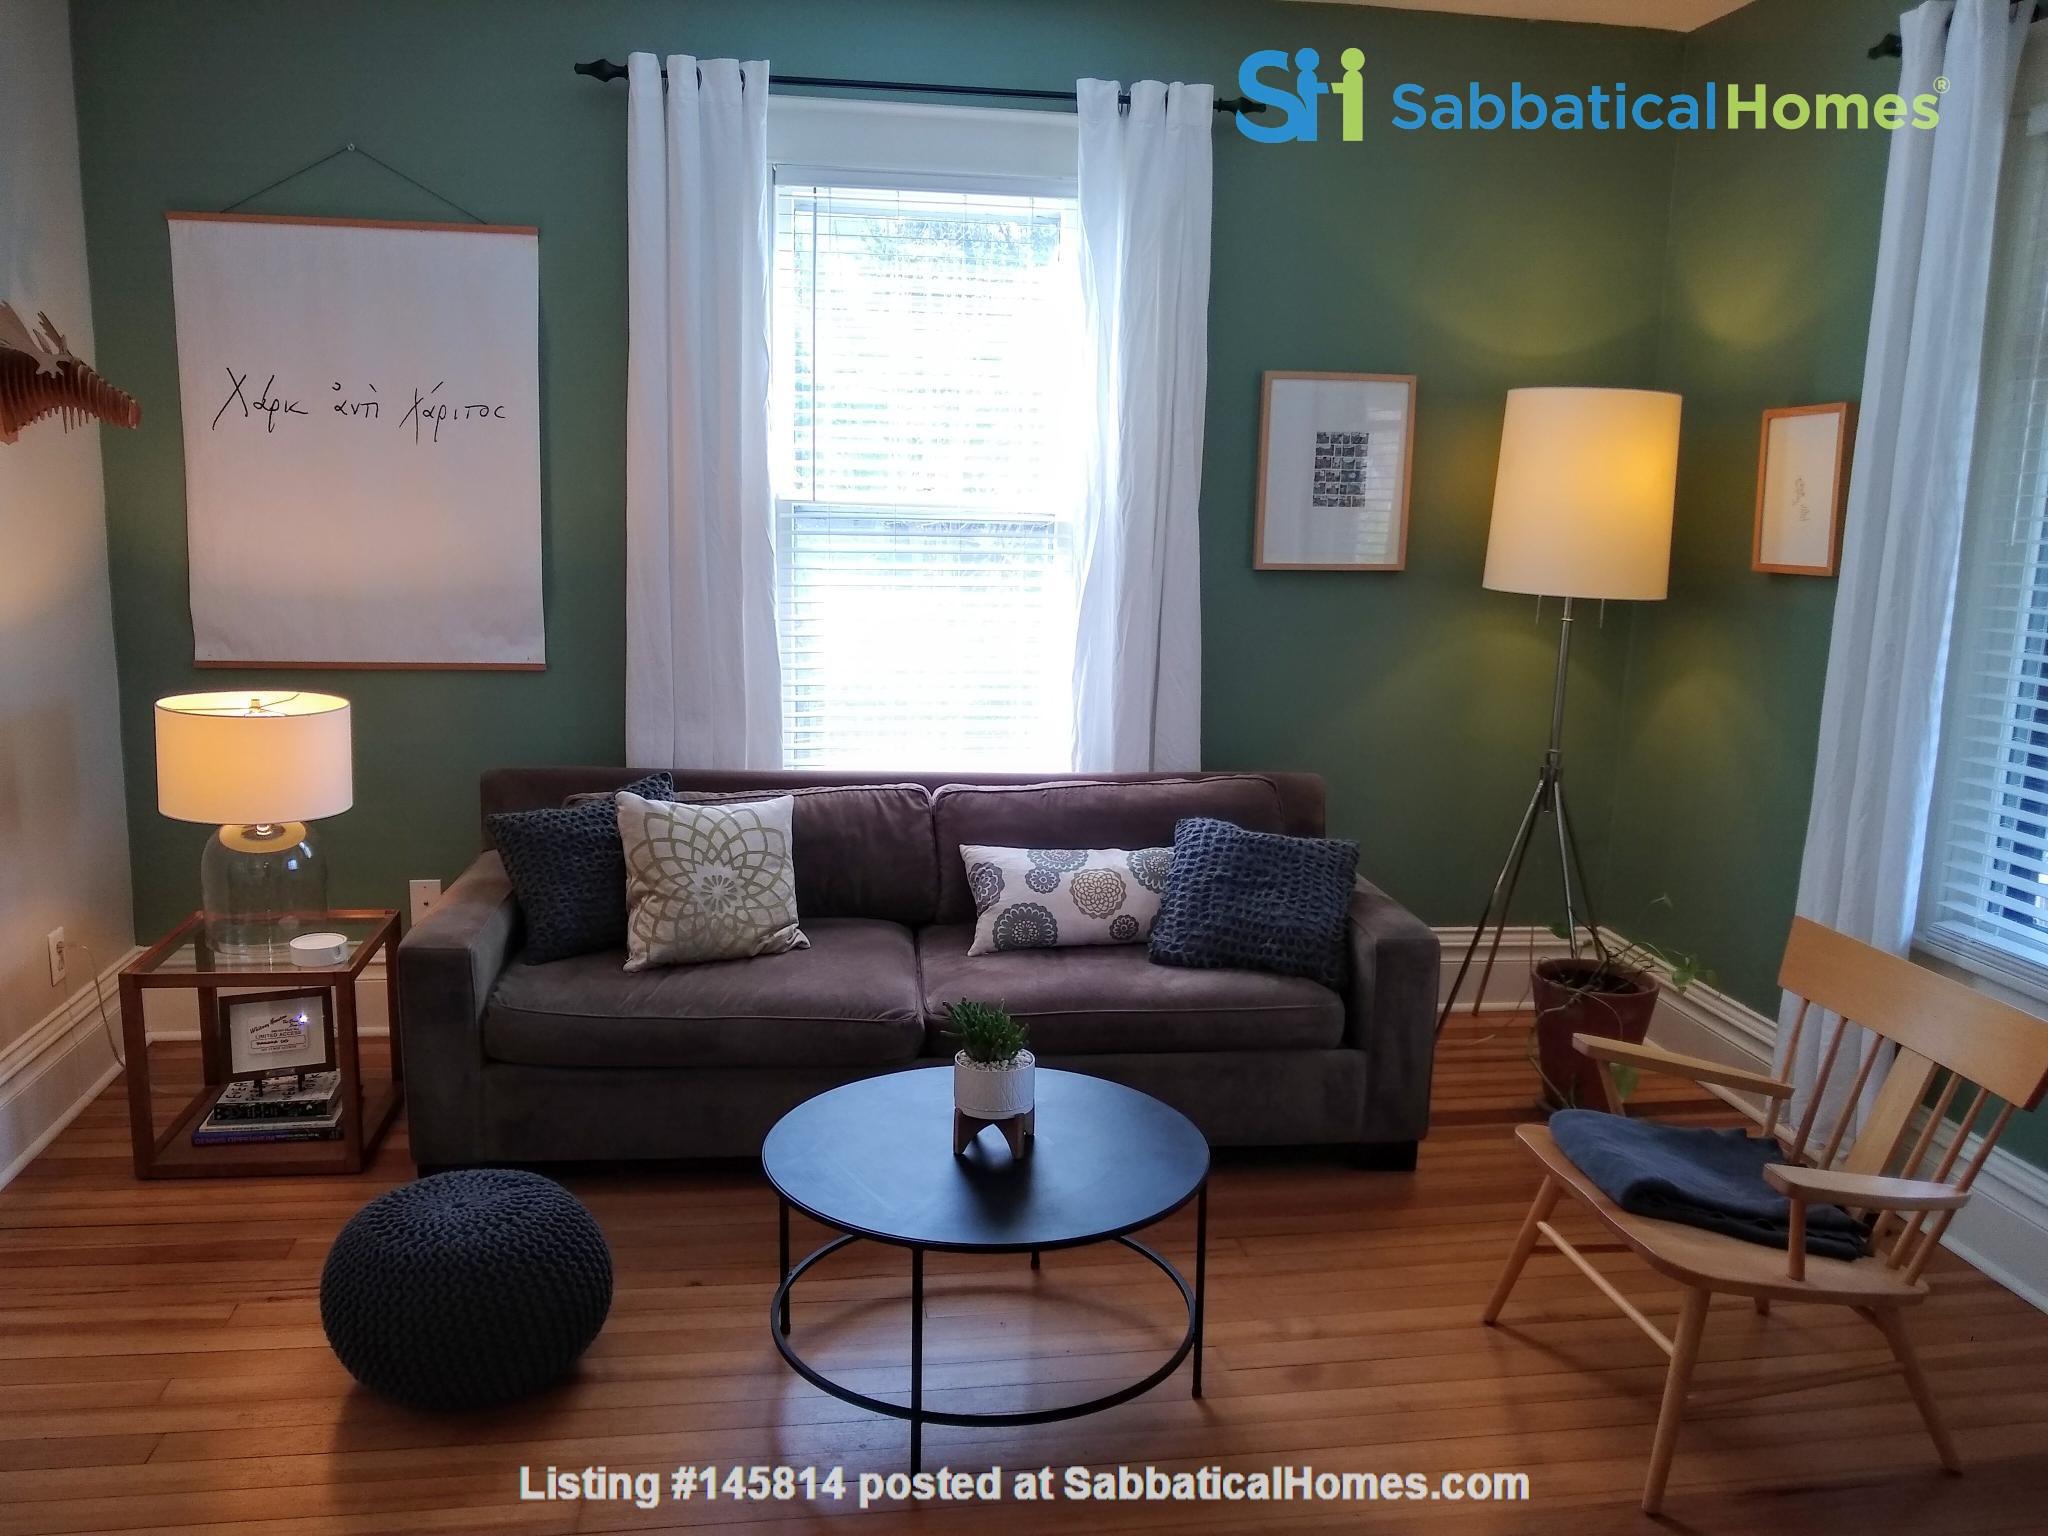 Classic & Stylish Prairie Square Home Rental in Iowa City 1